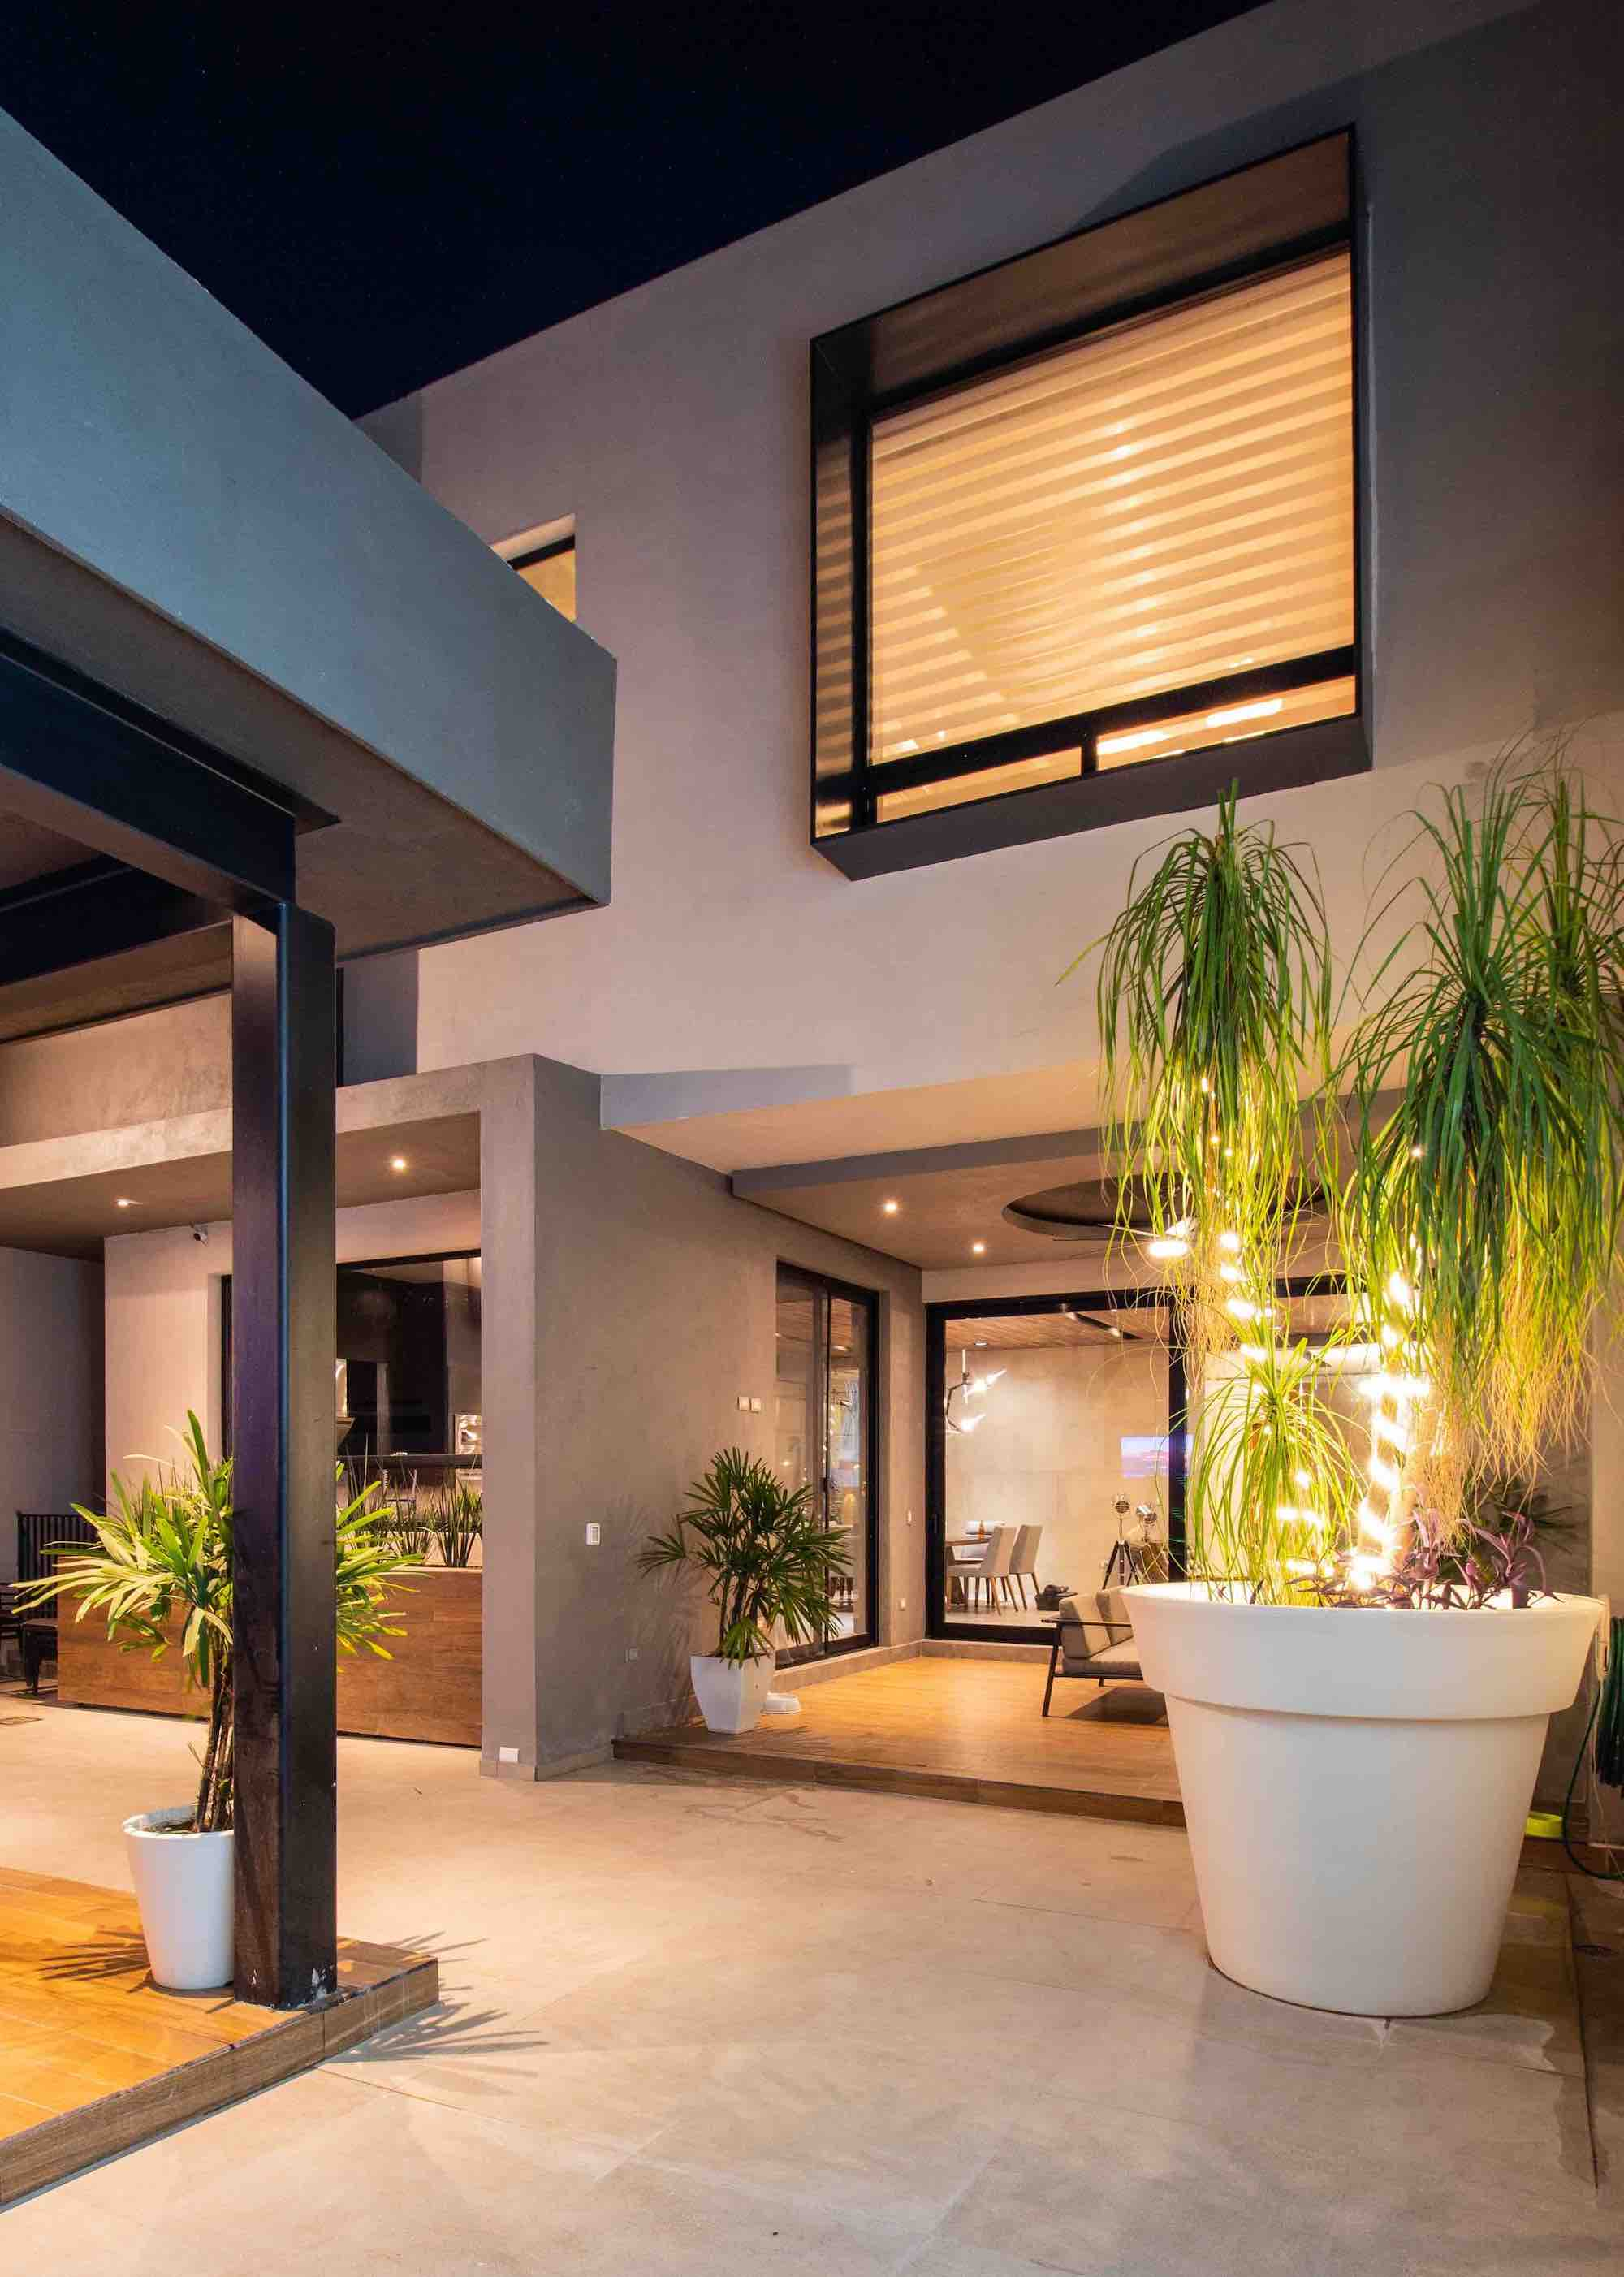 GR_House_Gallardo_arquitectura_amazingarchitecture_mexico_004.jpg